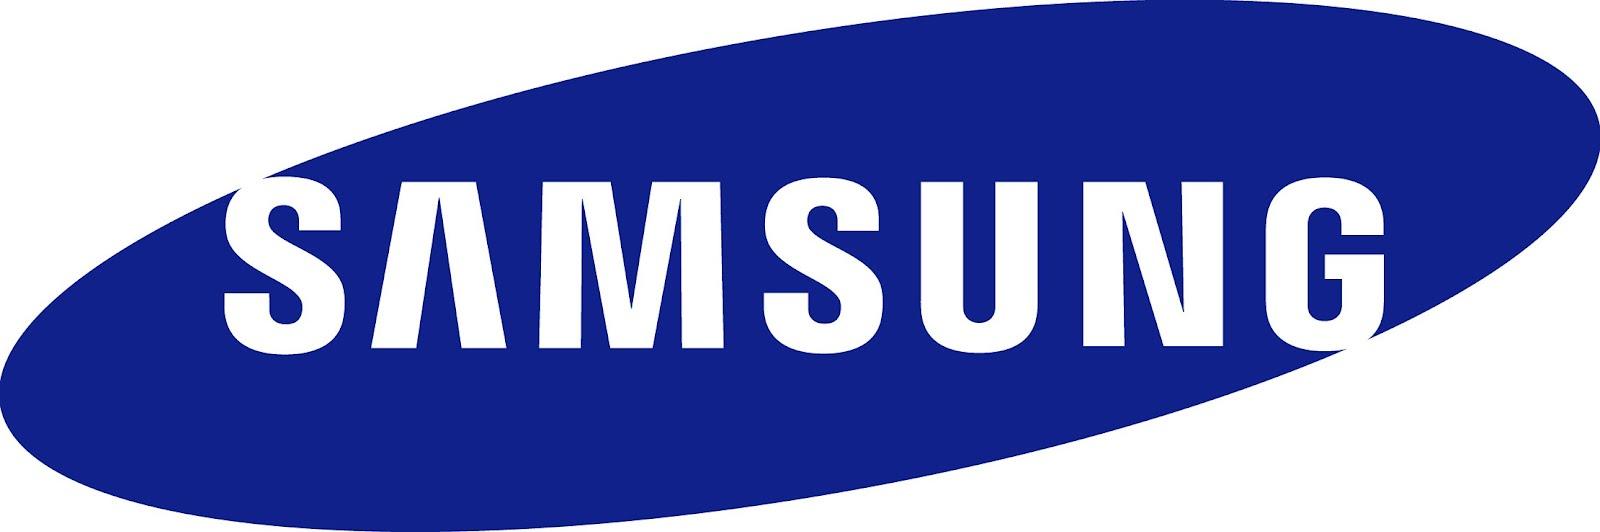 Harga Samsung Baru April 2012 Disertai Gambar Seputar